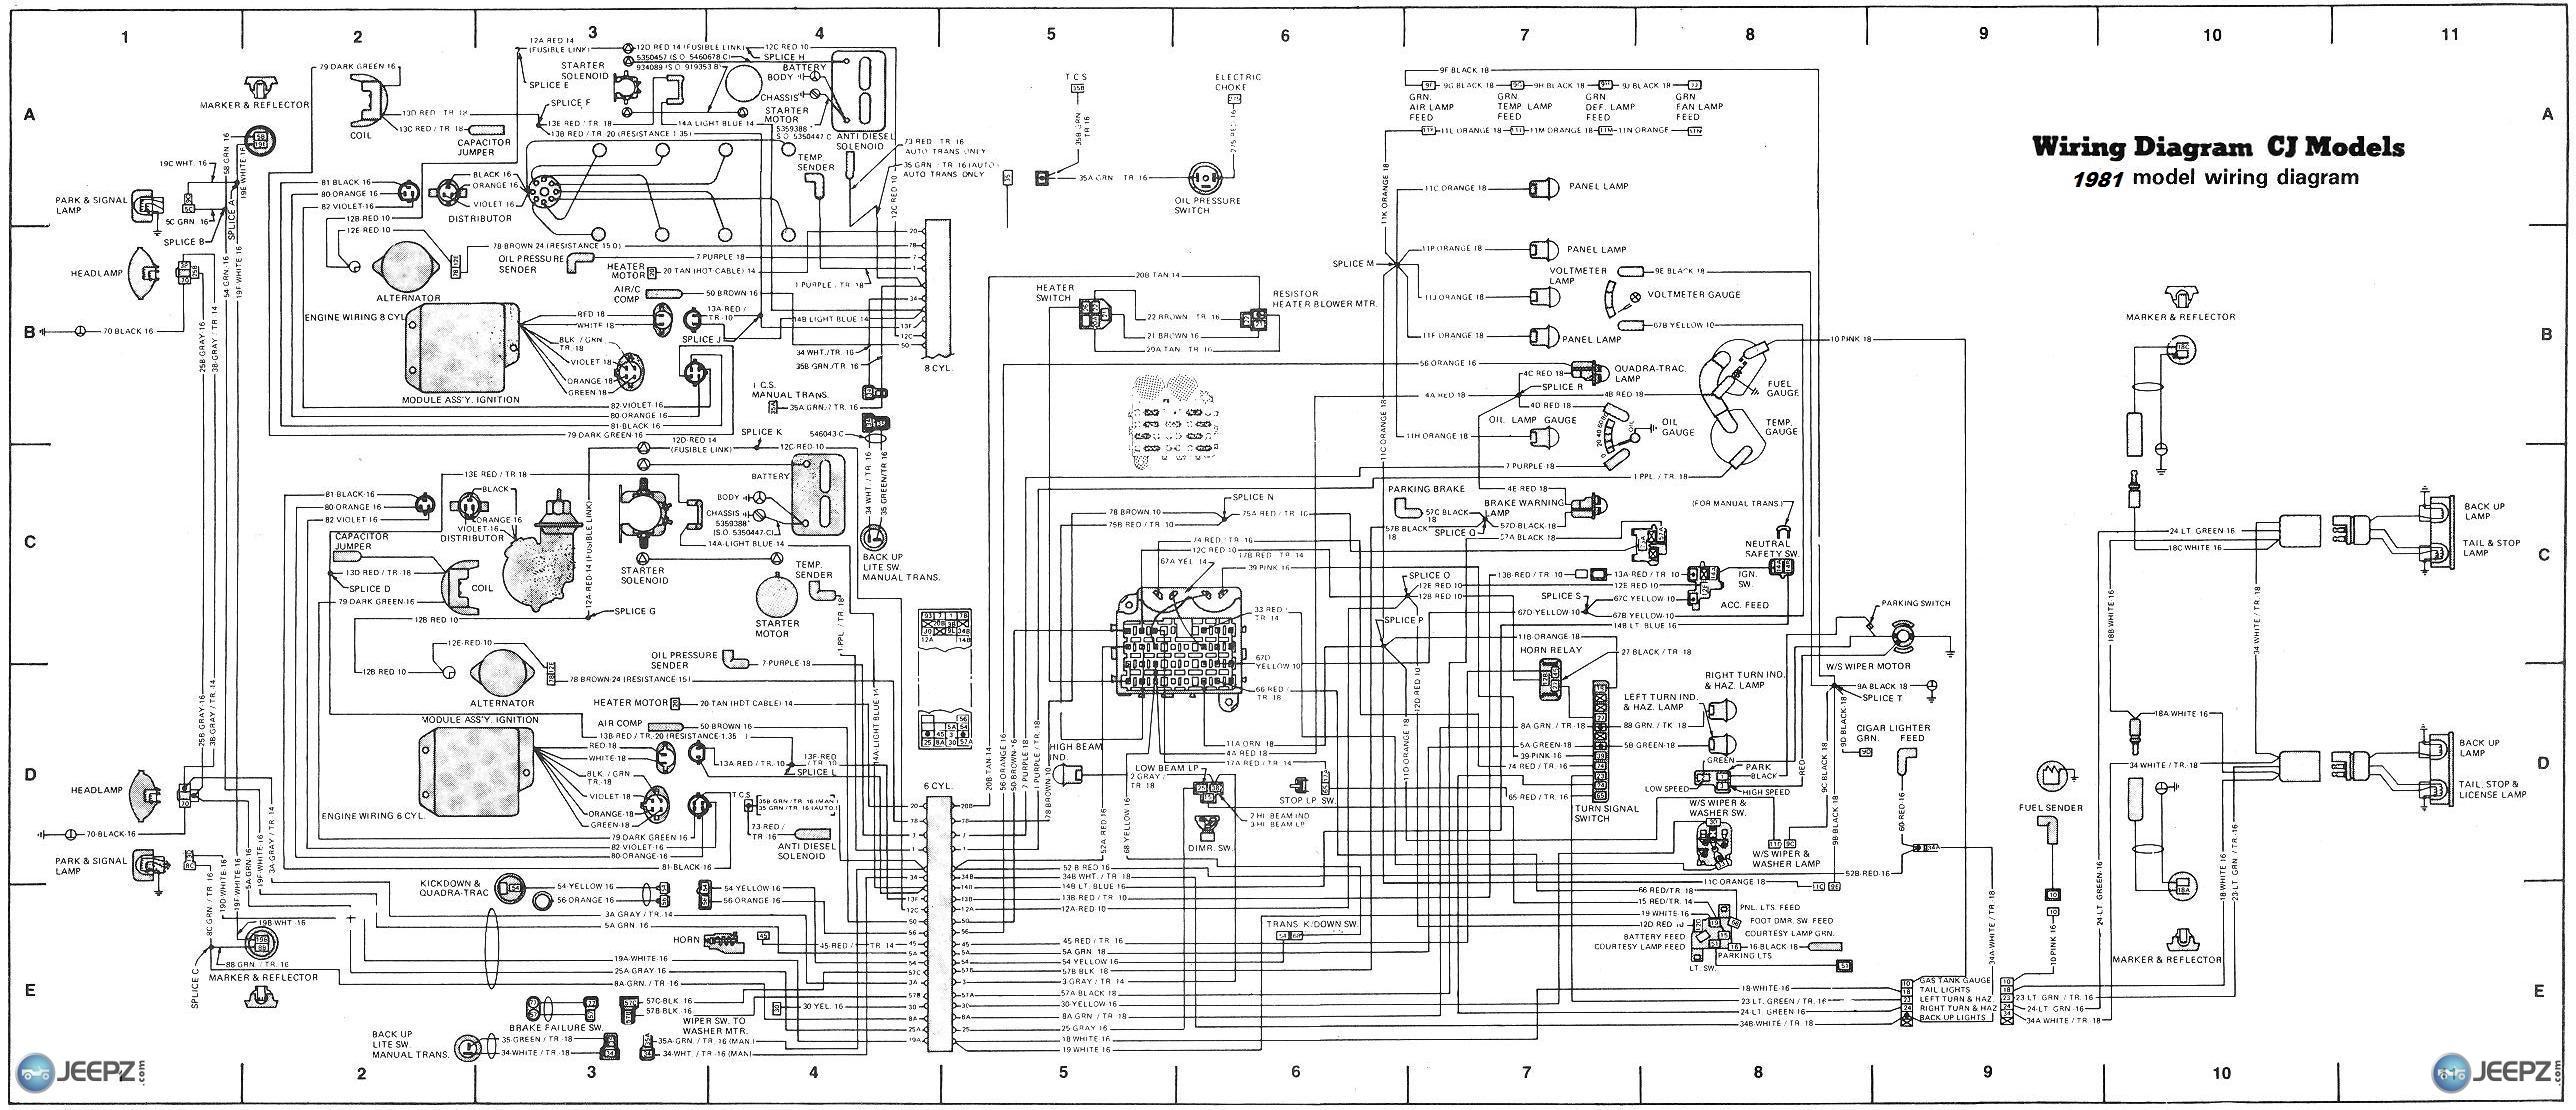 1983 jeep cj7 wiring harness diagram wiring diagram article Jeep CJ7 Dash Speakers